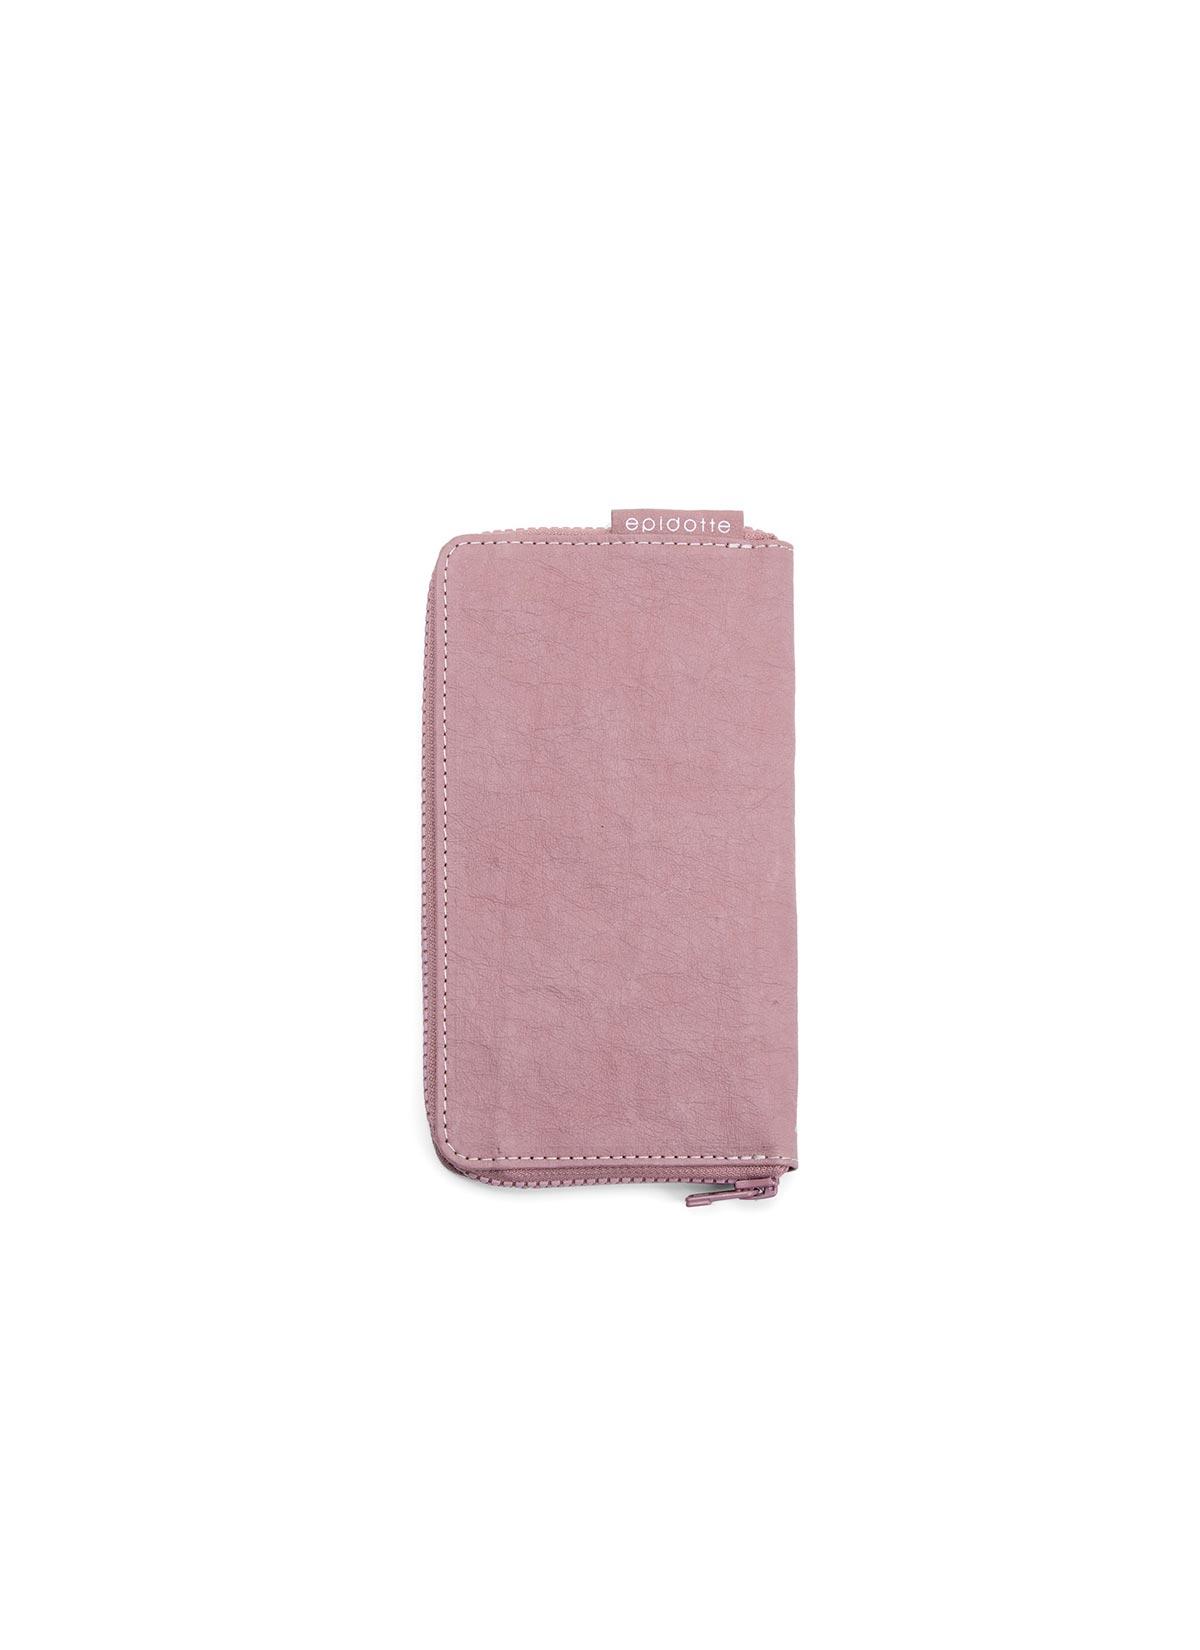 Zipped Wallet Amberrose